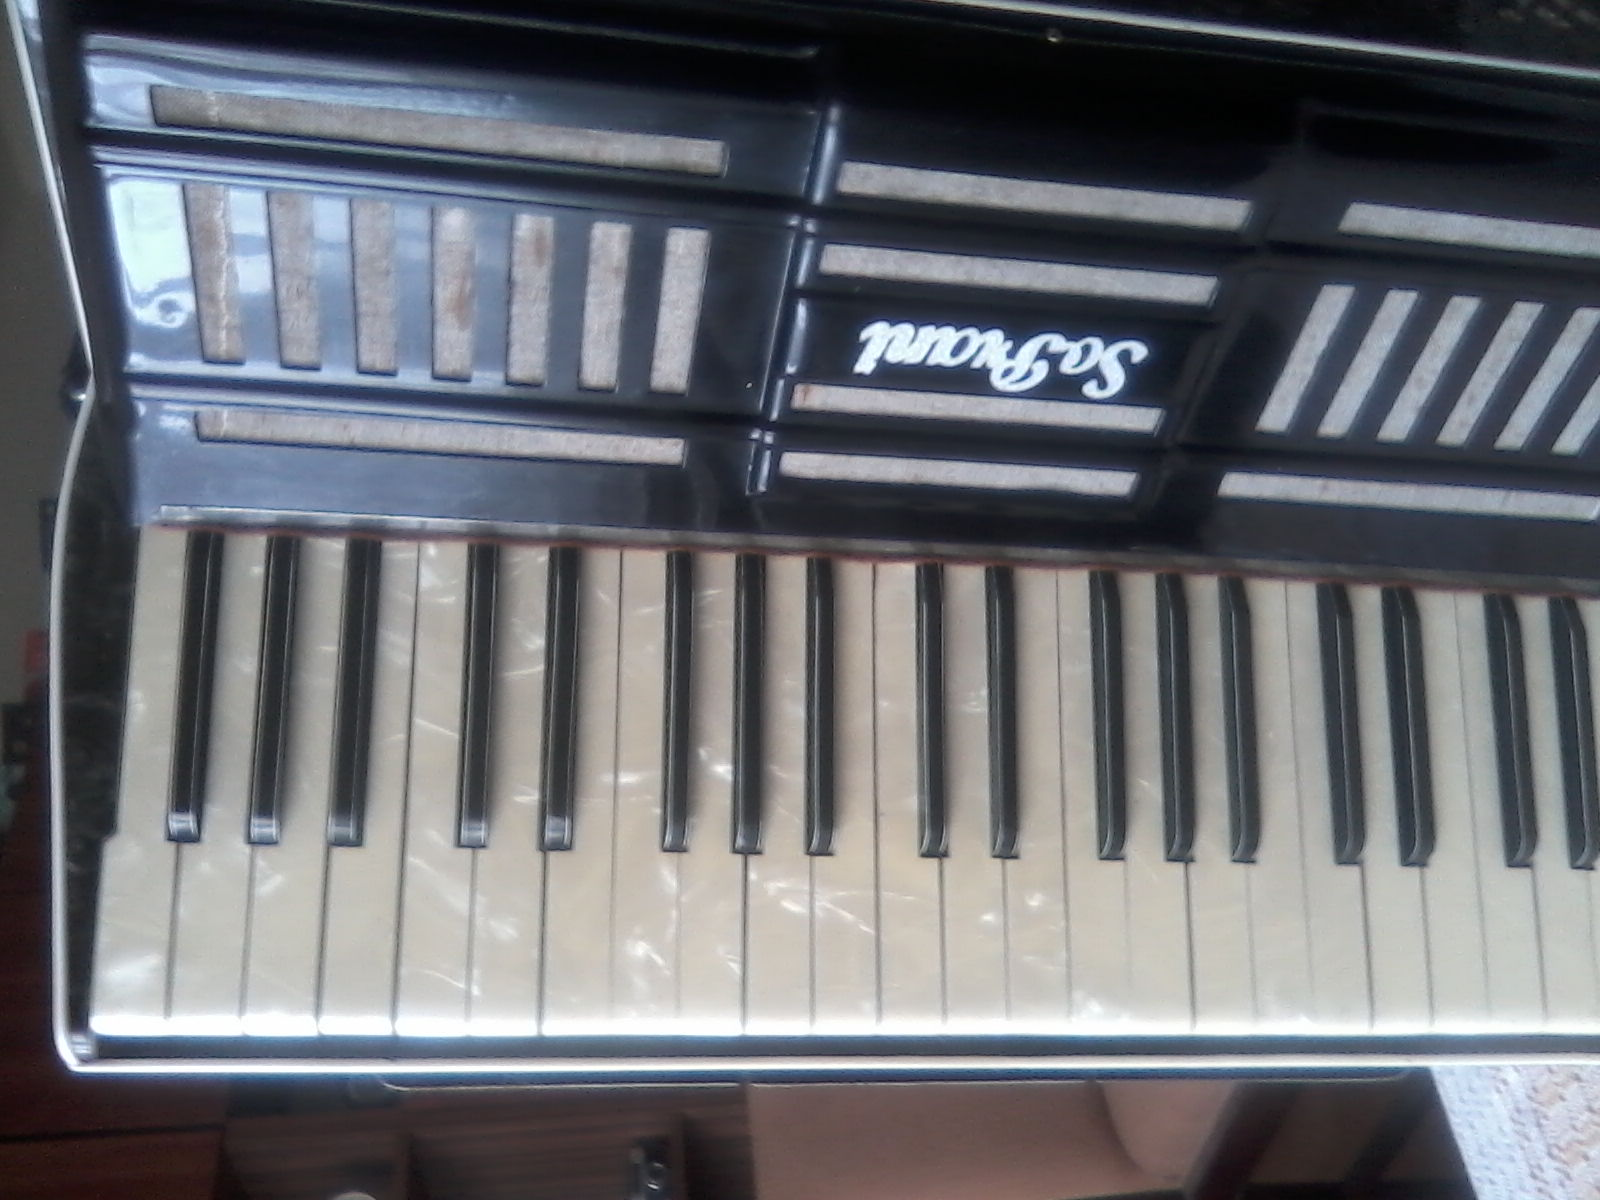 Sprzedam stary model akordeonu Soprani